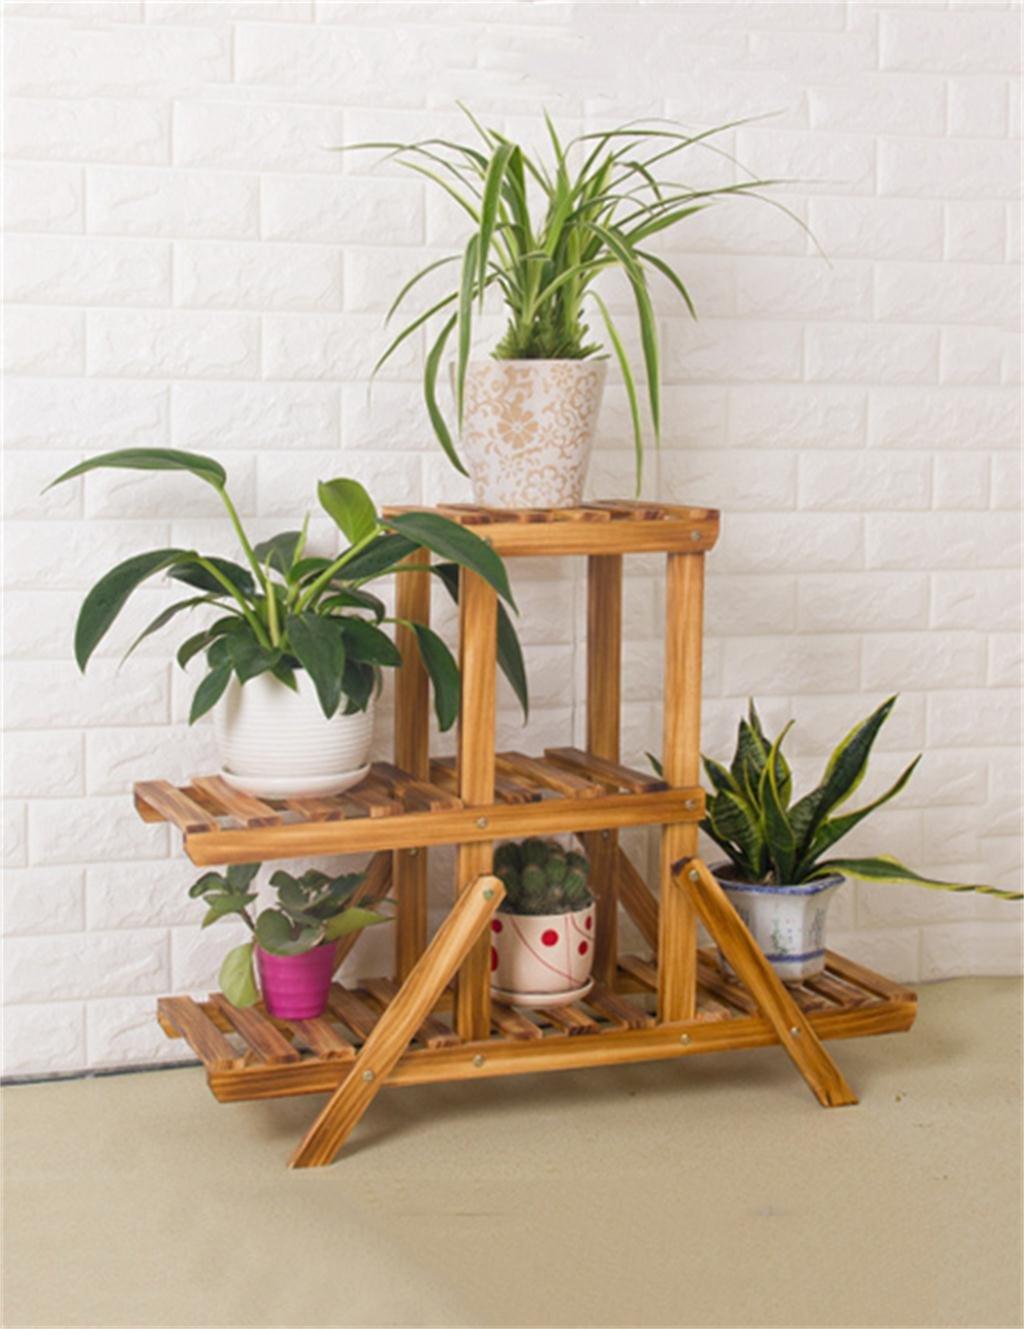 Xyz multi tier holzboden blumentopf regal pflanzen stehen for Tier blumentopf